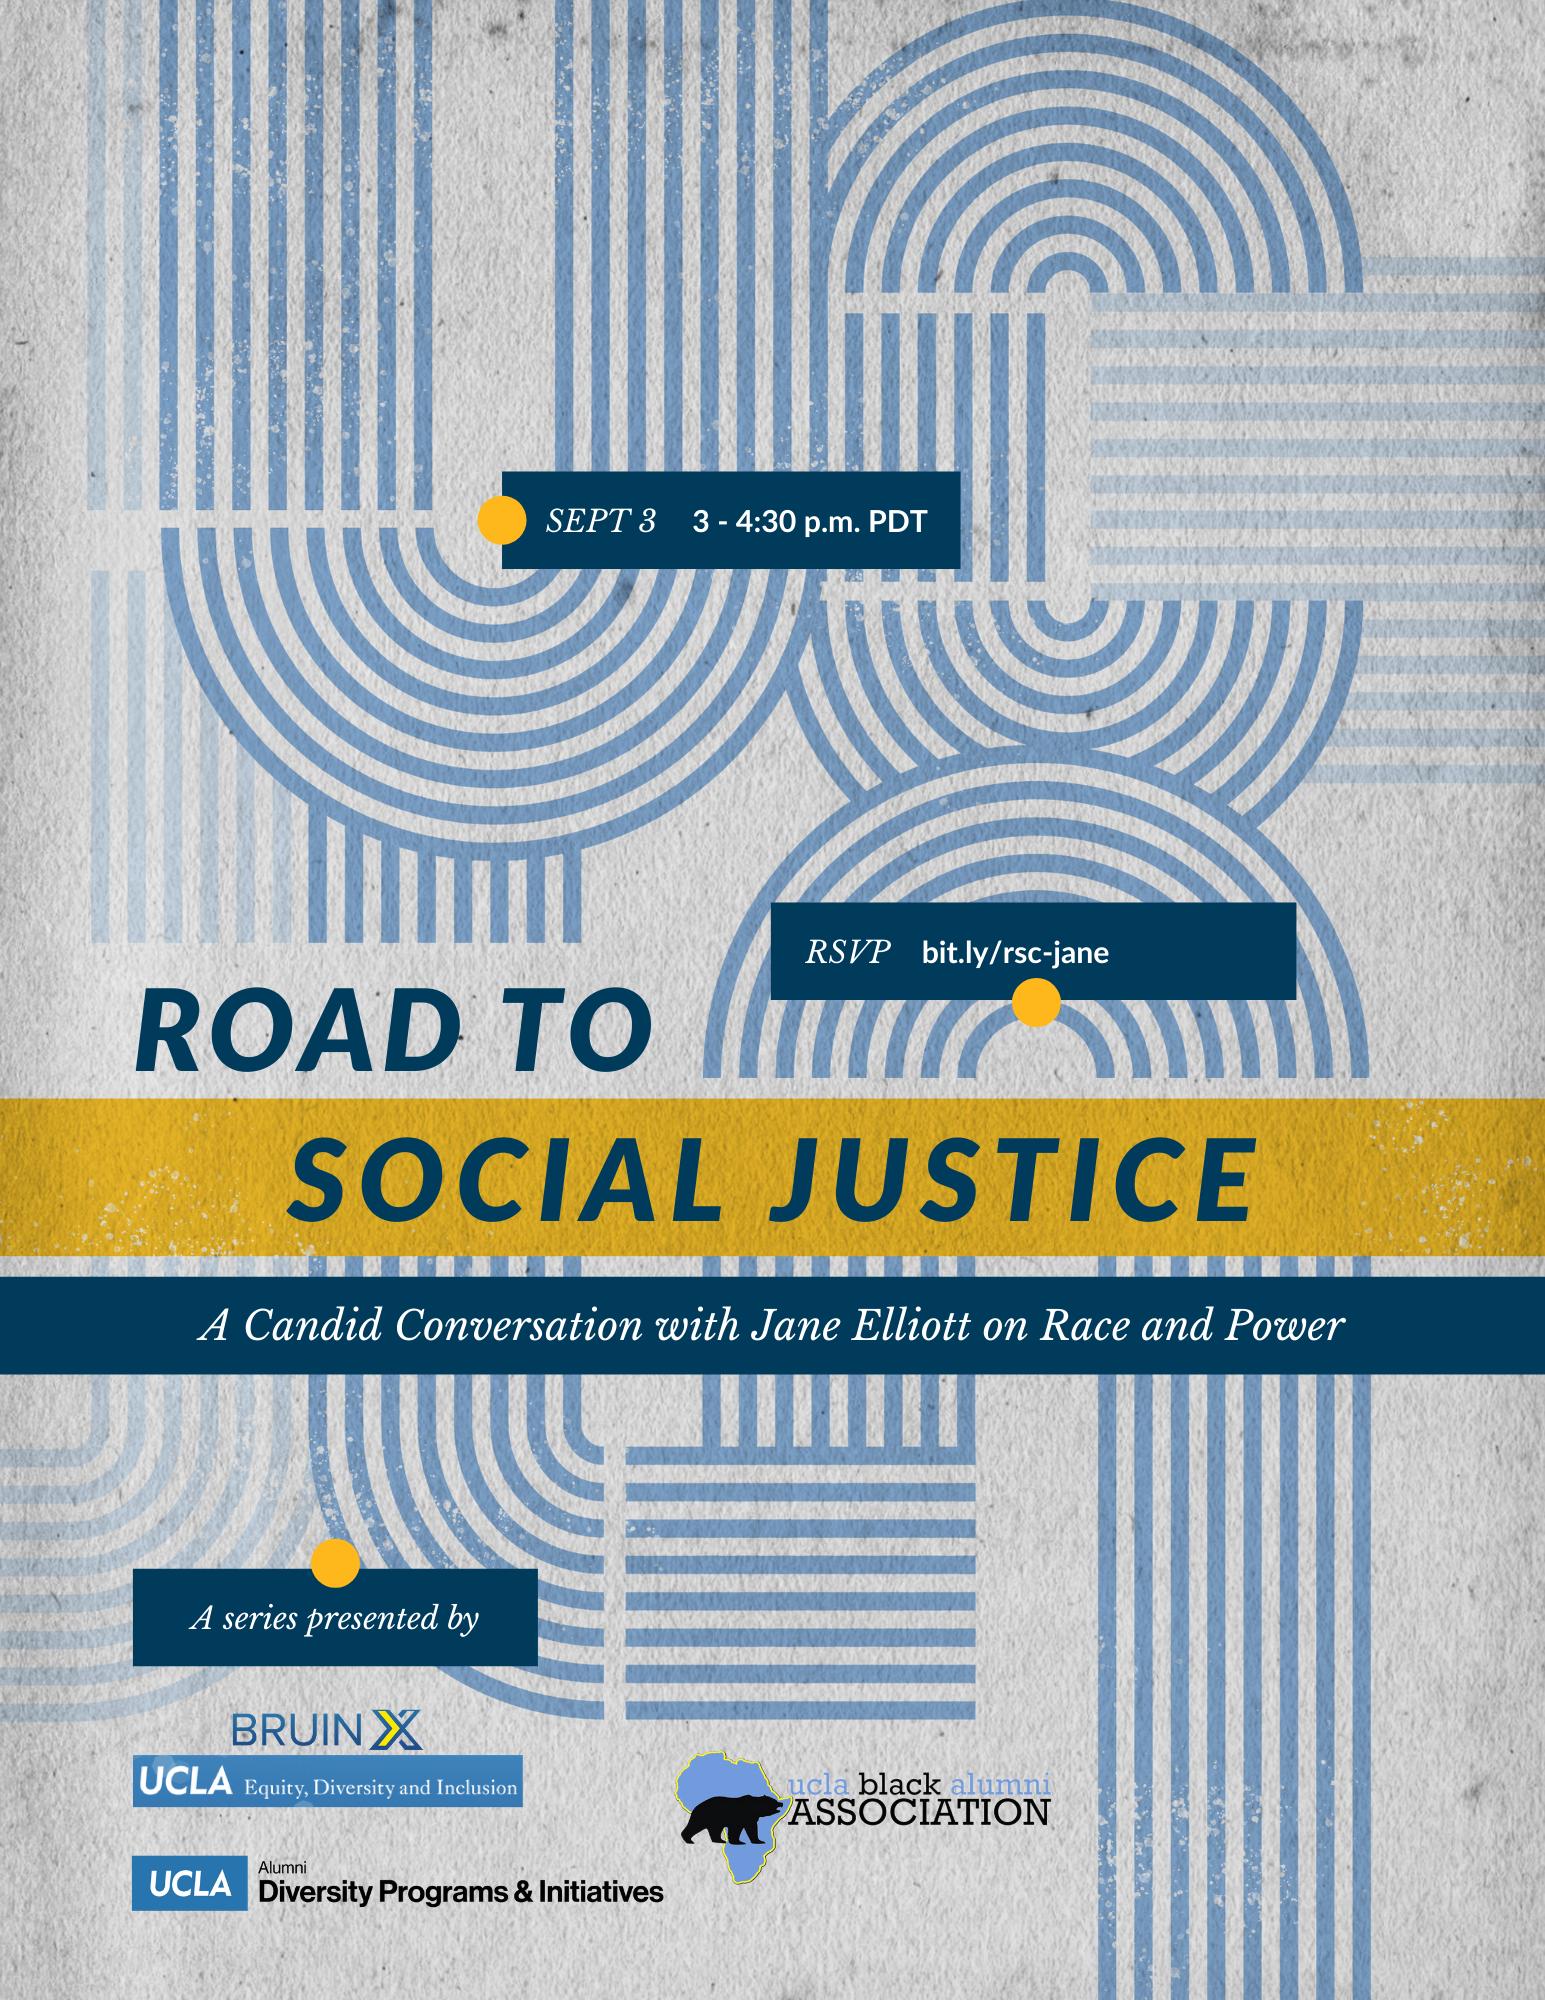 flyer for road to social justice jane elliott event